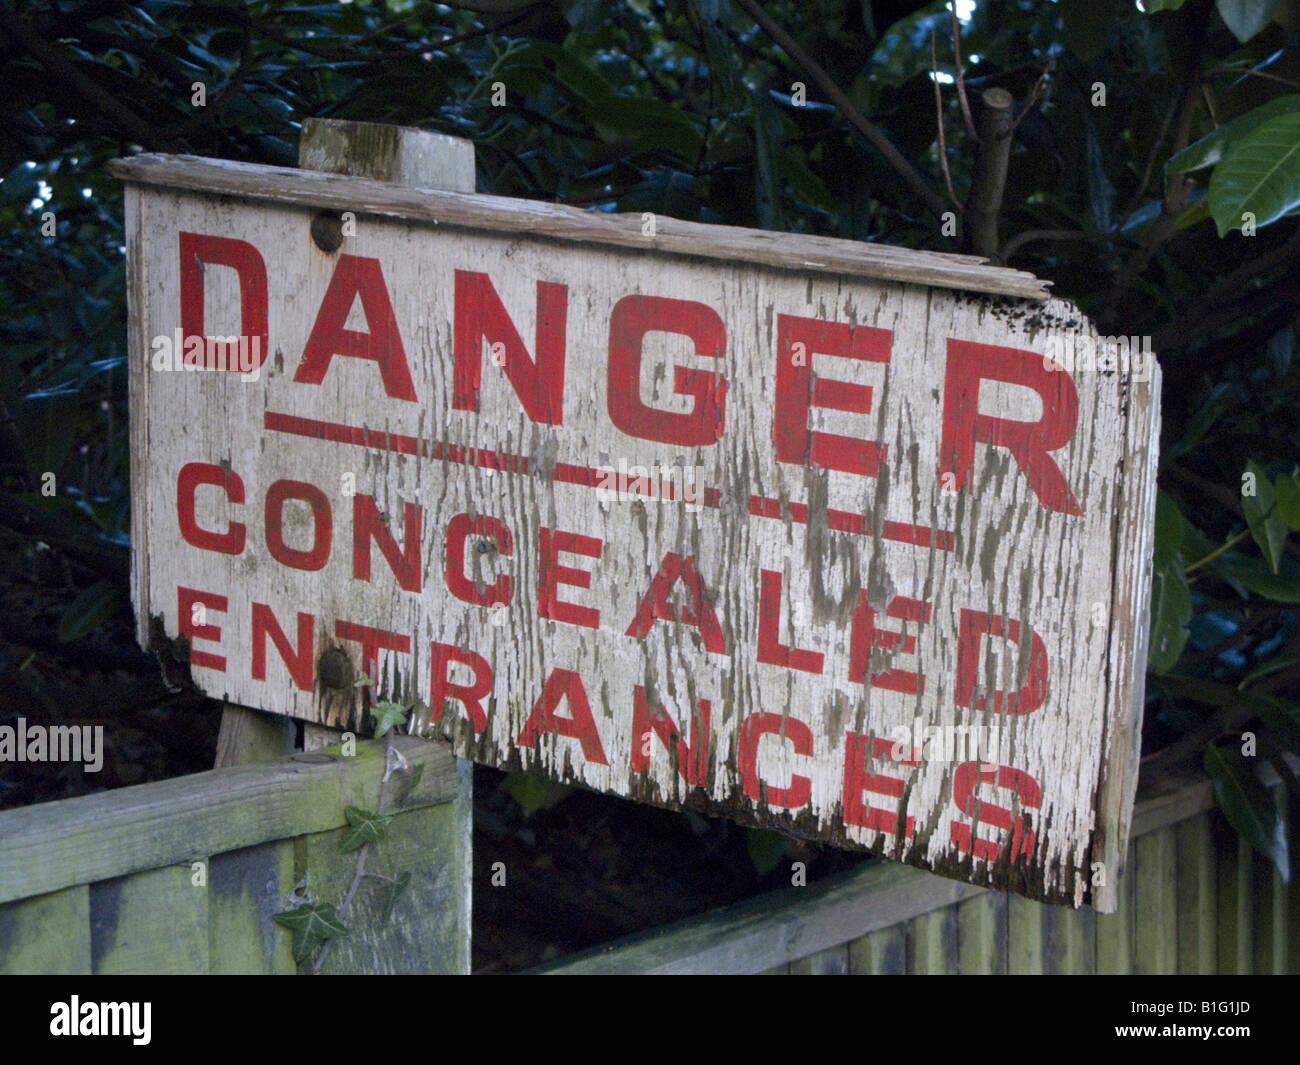 Concealed Entrances sign - Stock Image